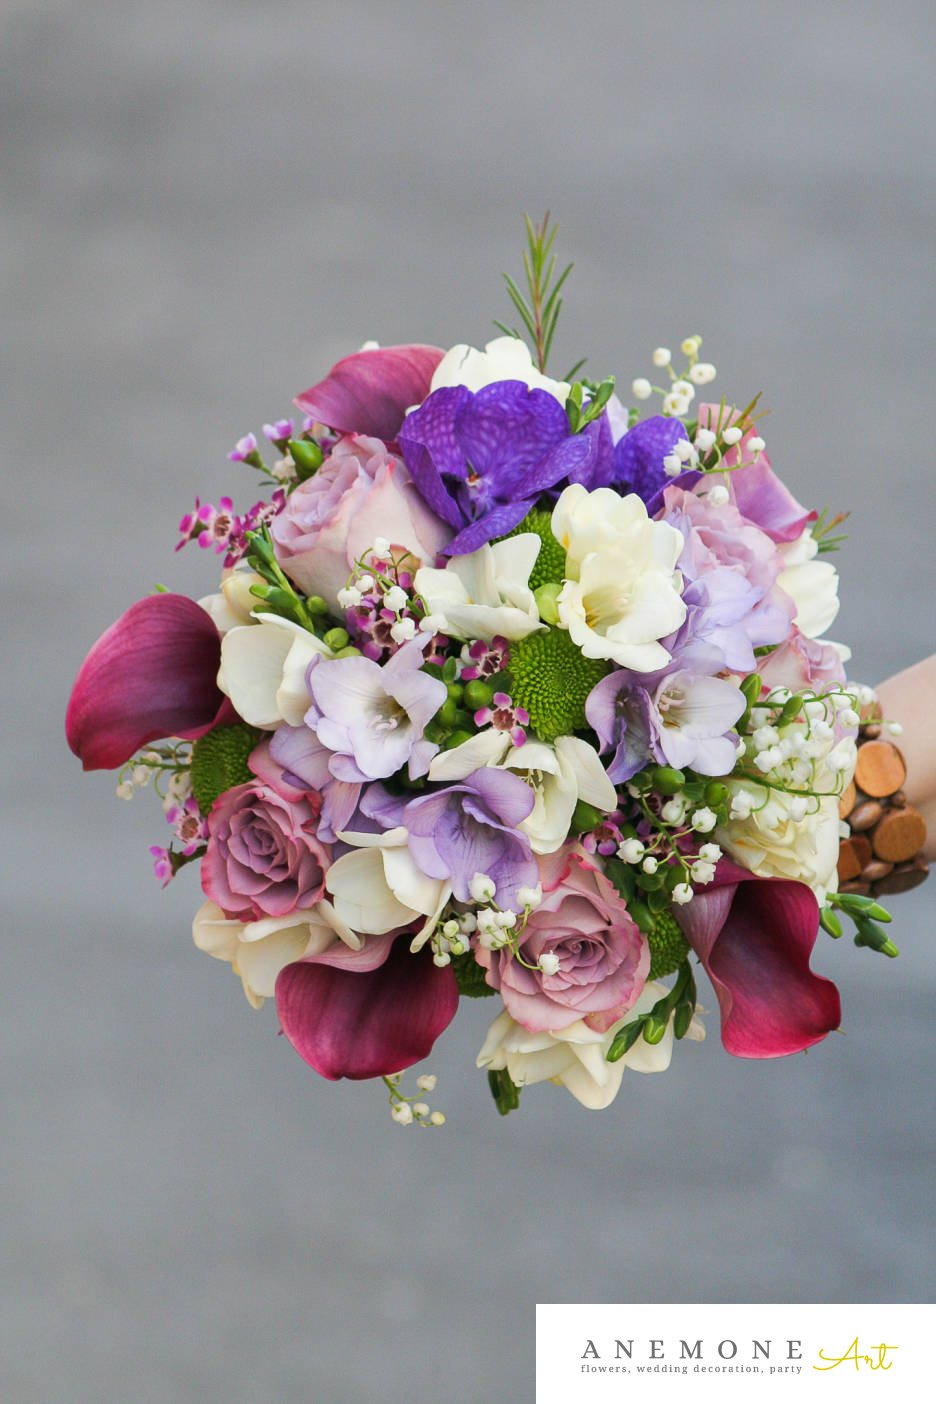 Poza, foto cu Flori de nunta buchet mireasa, calla, crizanteme, frezii, lacramioare, multicolor, orhidee, trandafiri in Arad, Timisoara, Oradea (wedding flowers, bouquets) nunta Arad, Timisoara, Oradea